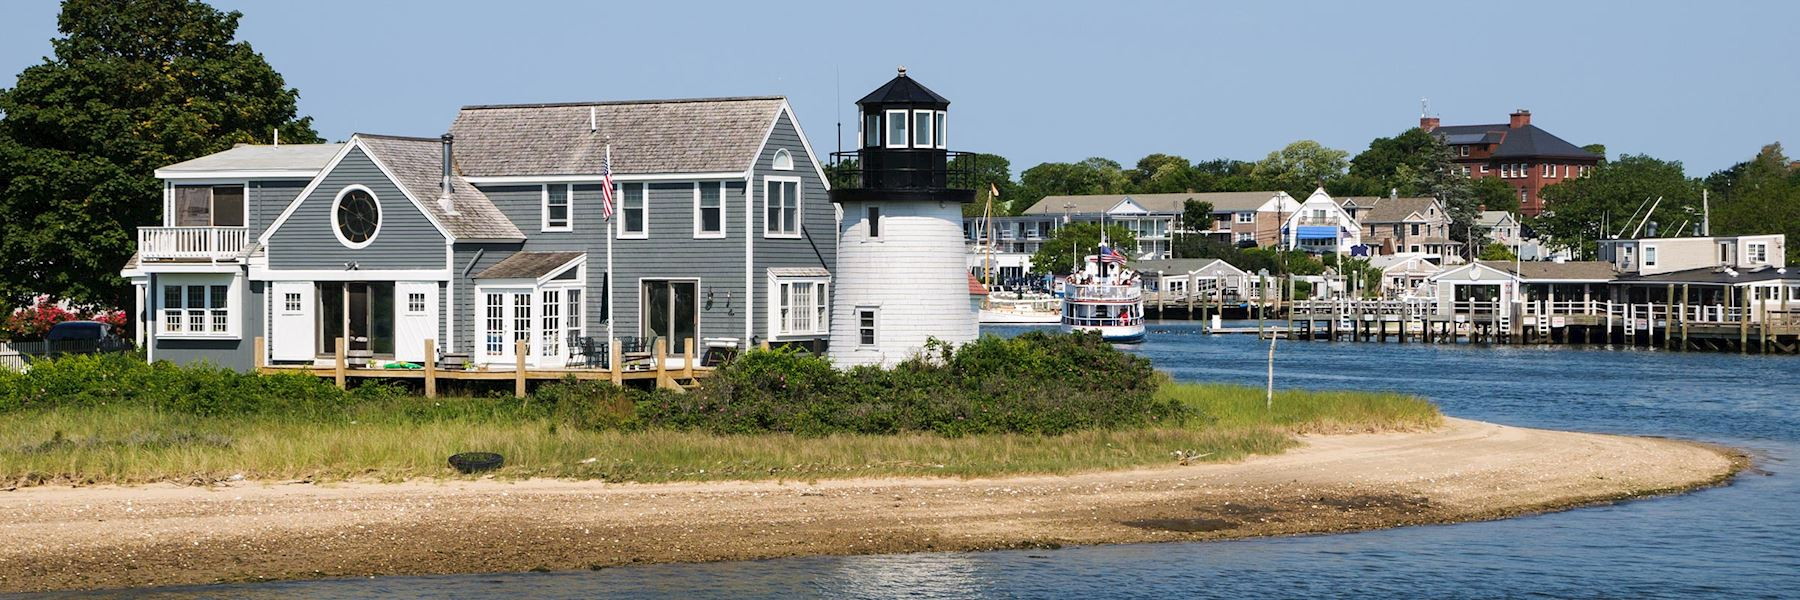 Visit Hyannis, New England